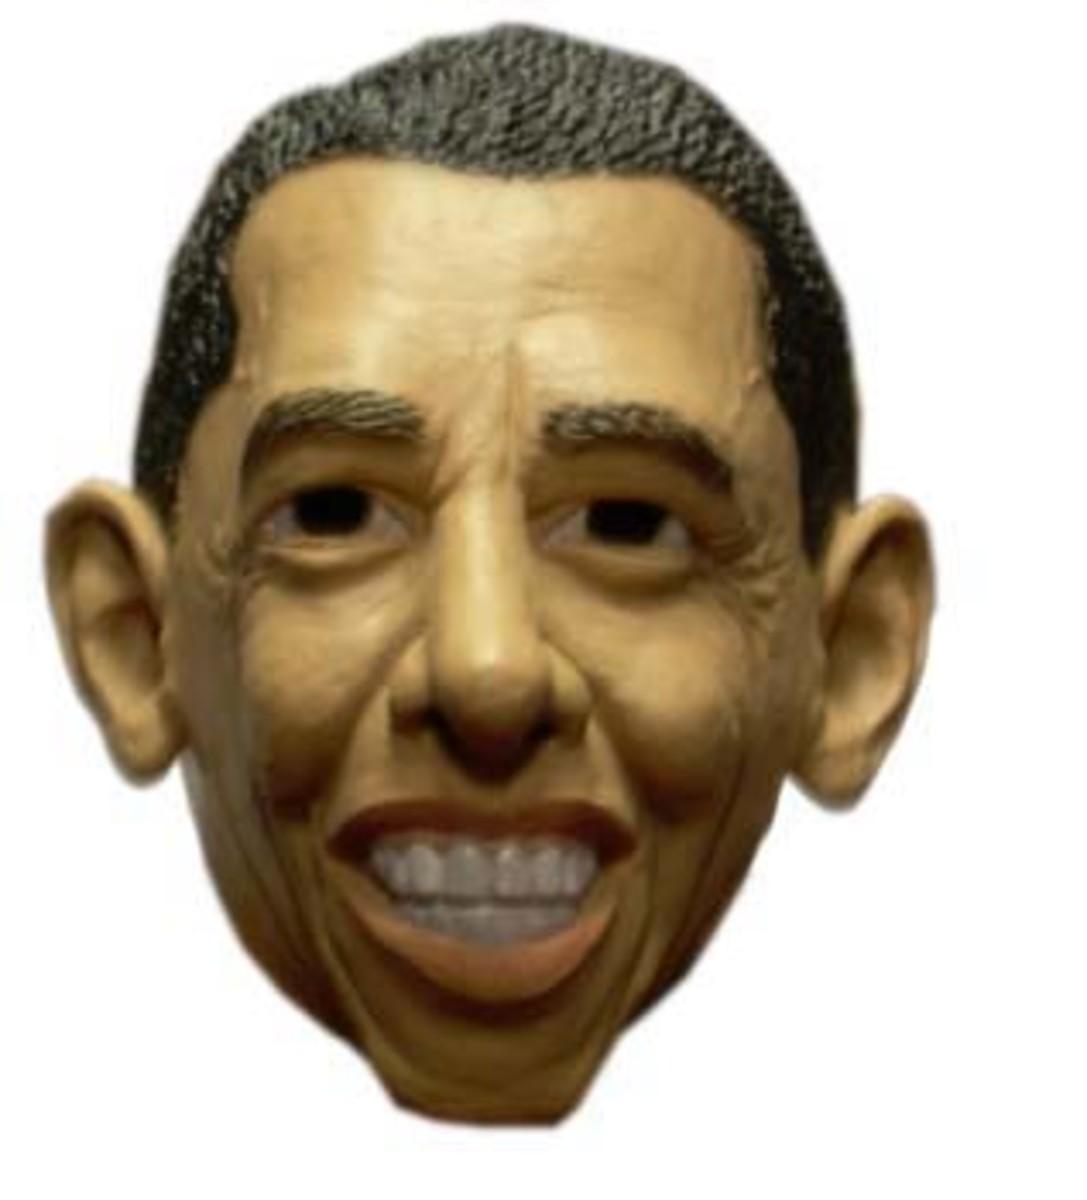 Obama (President)